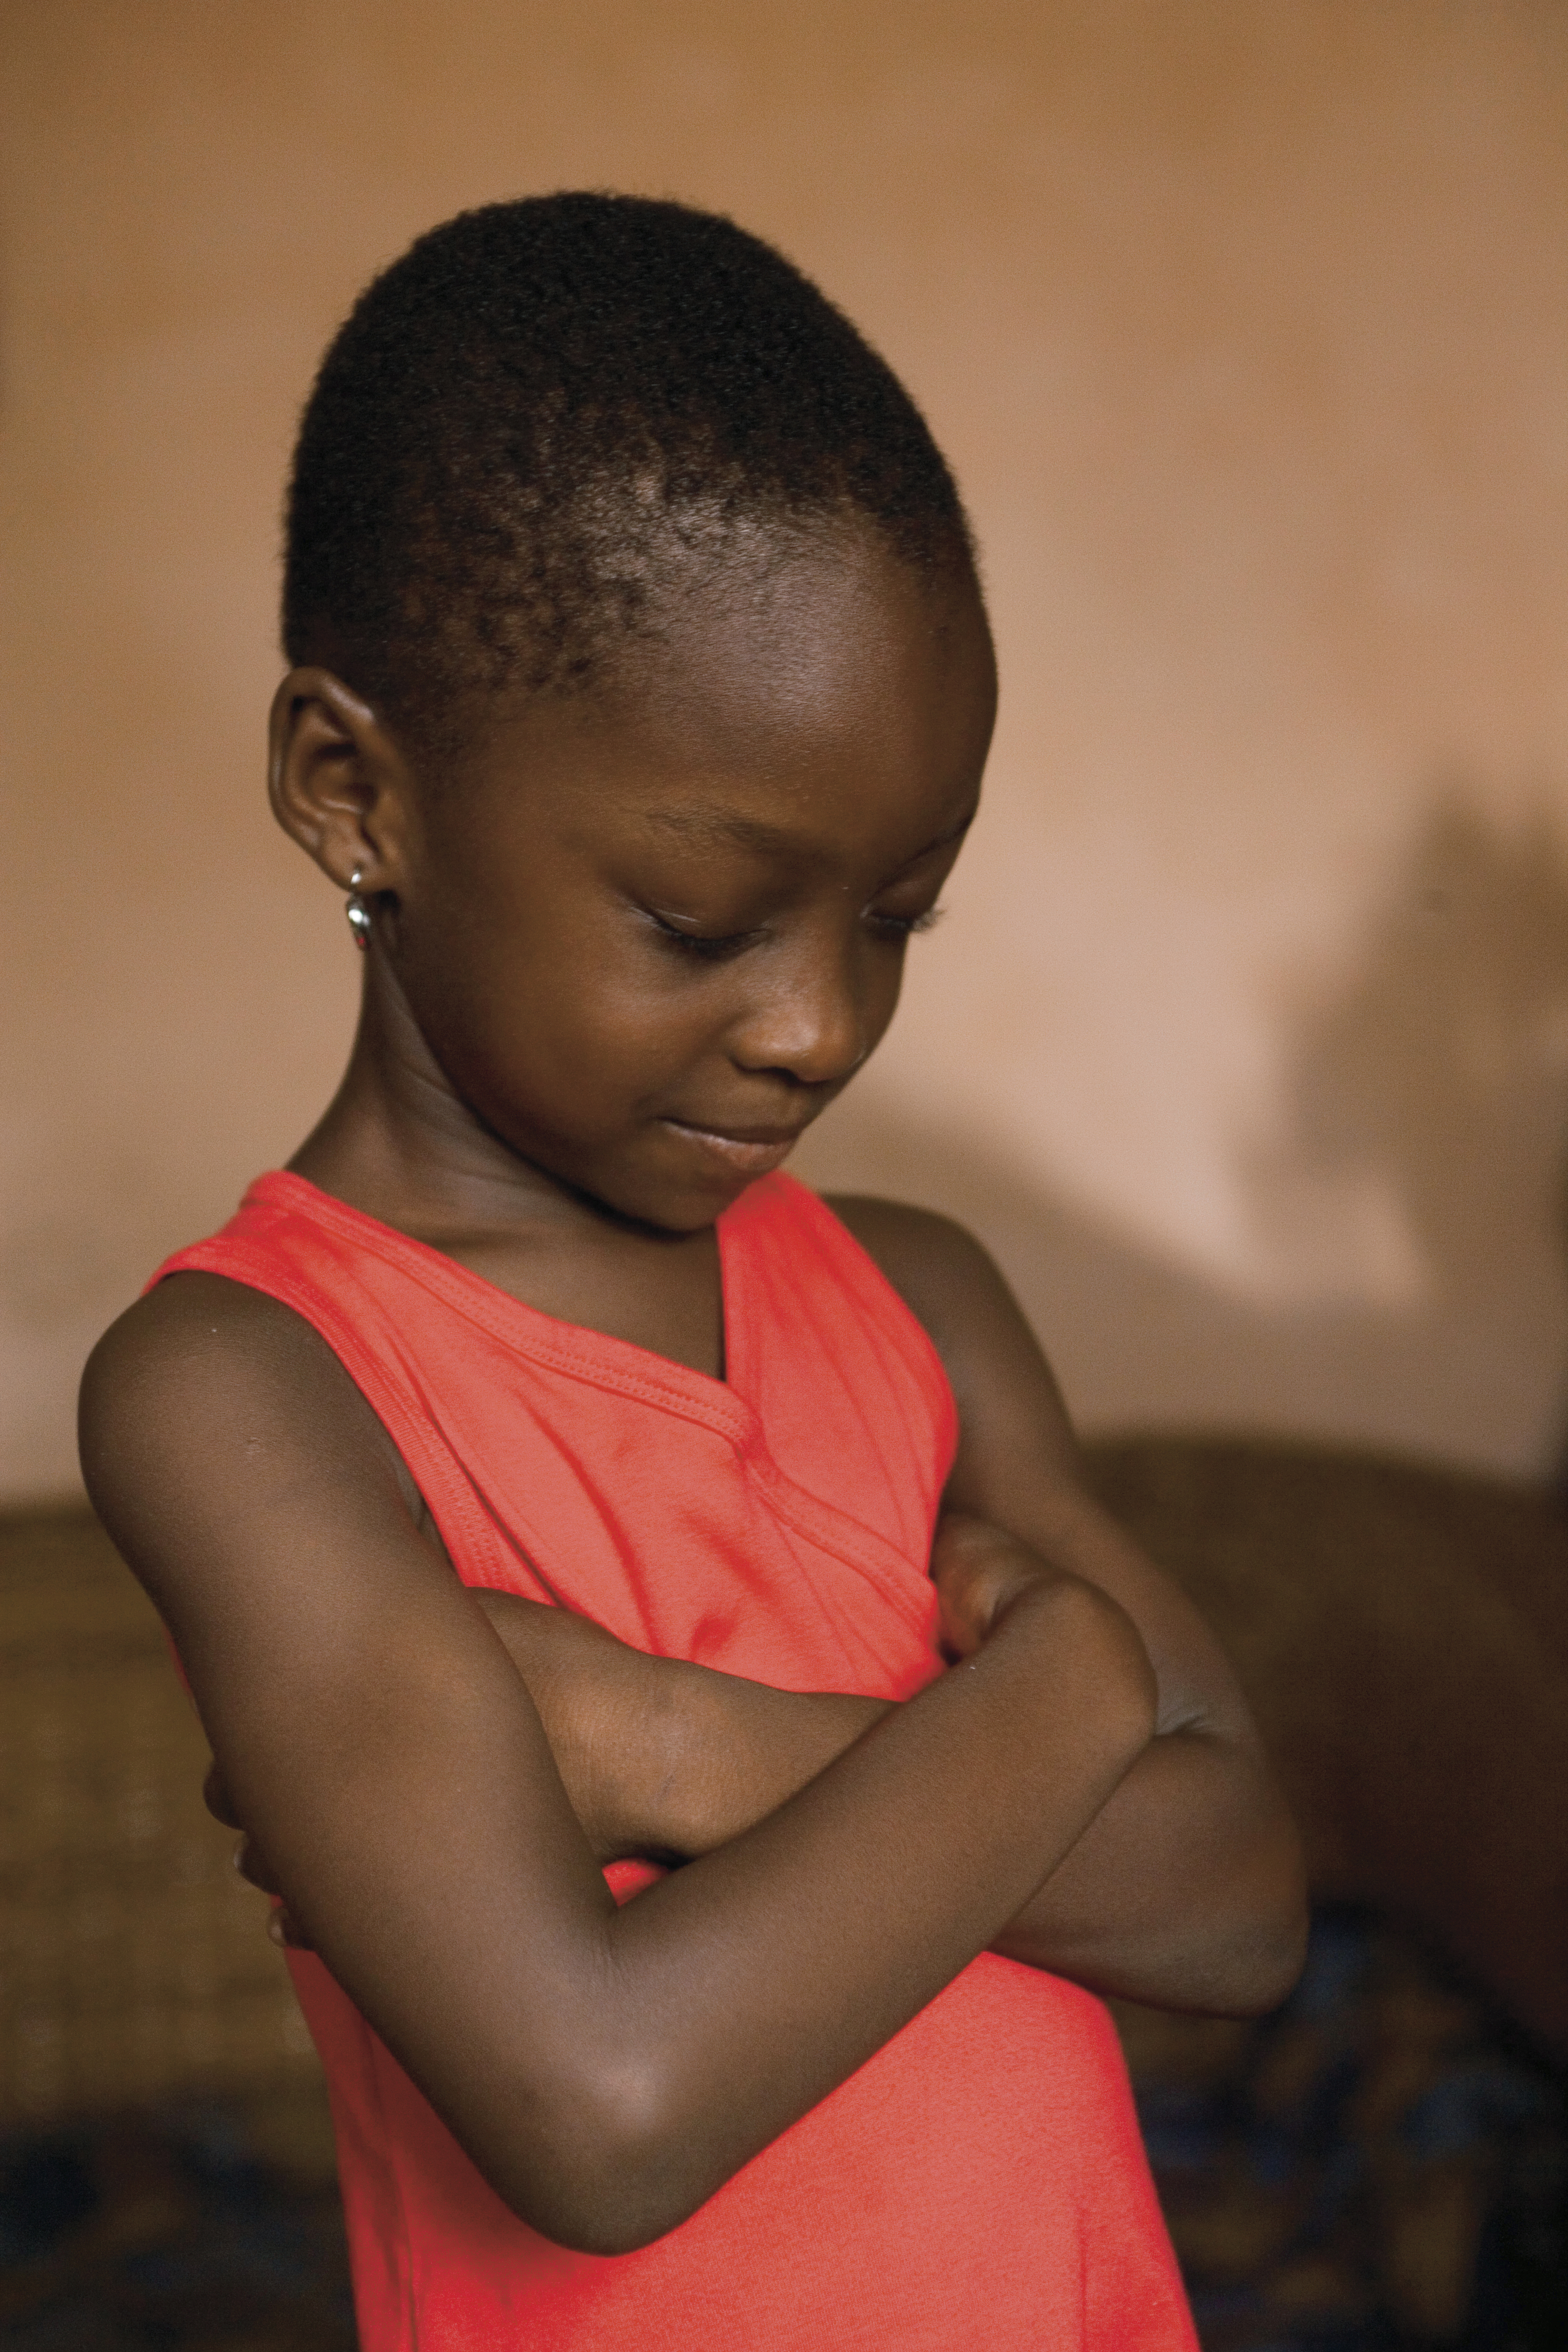 A girl from Ghana prays.